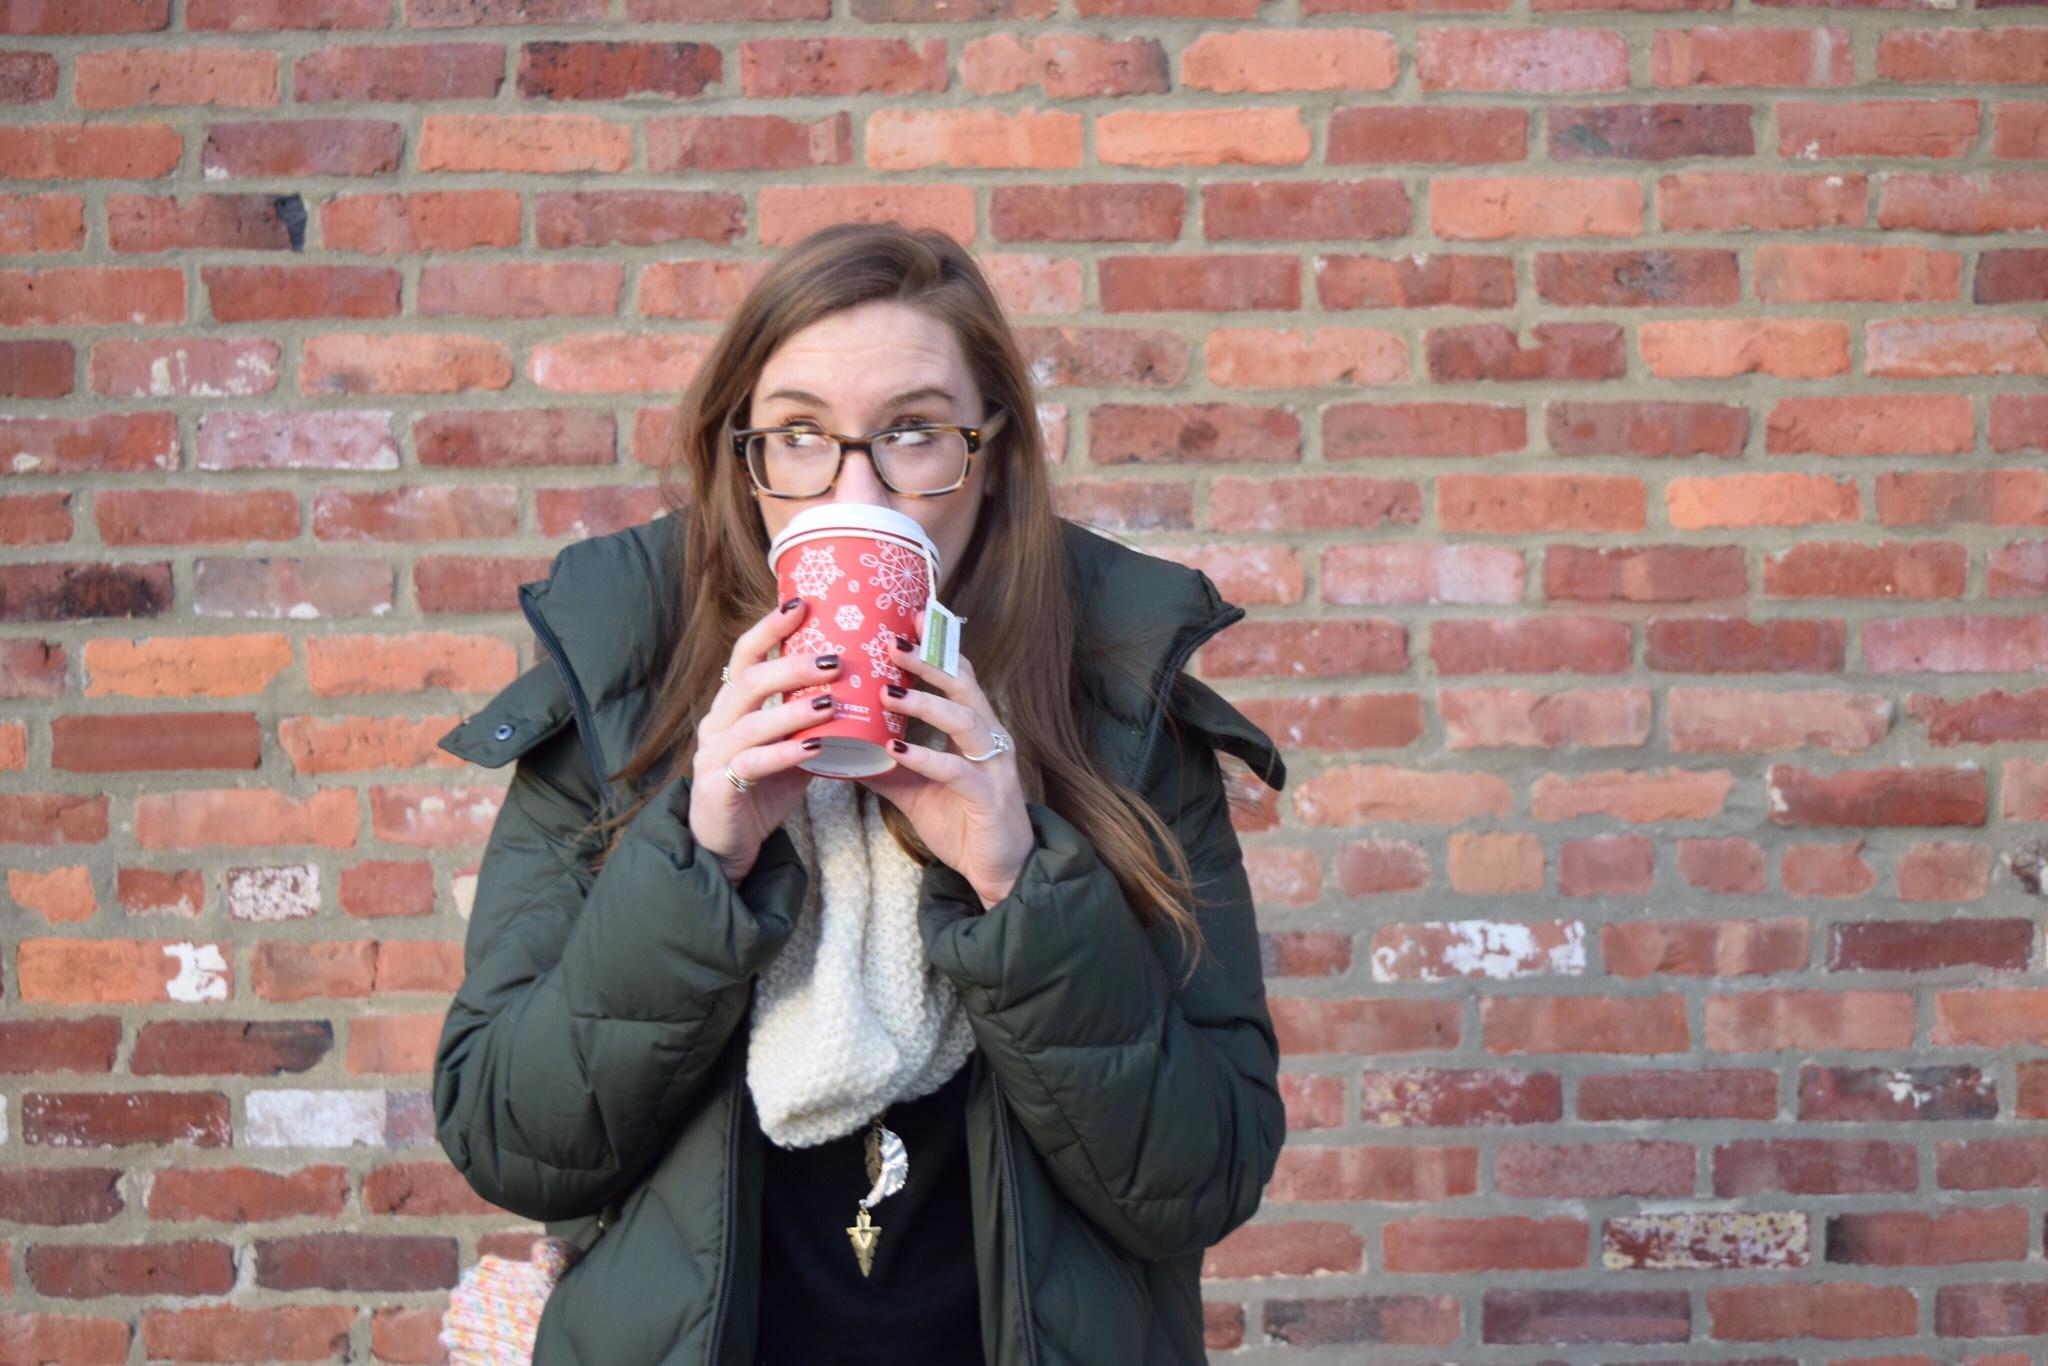 capital one cafe peets coffee boston